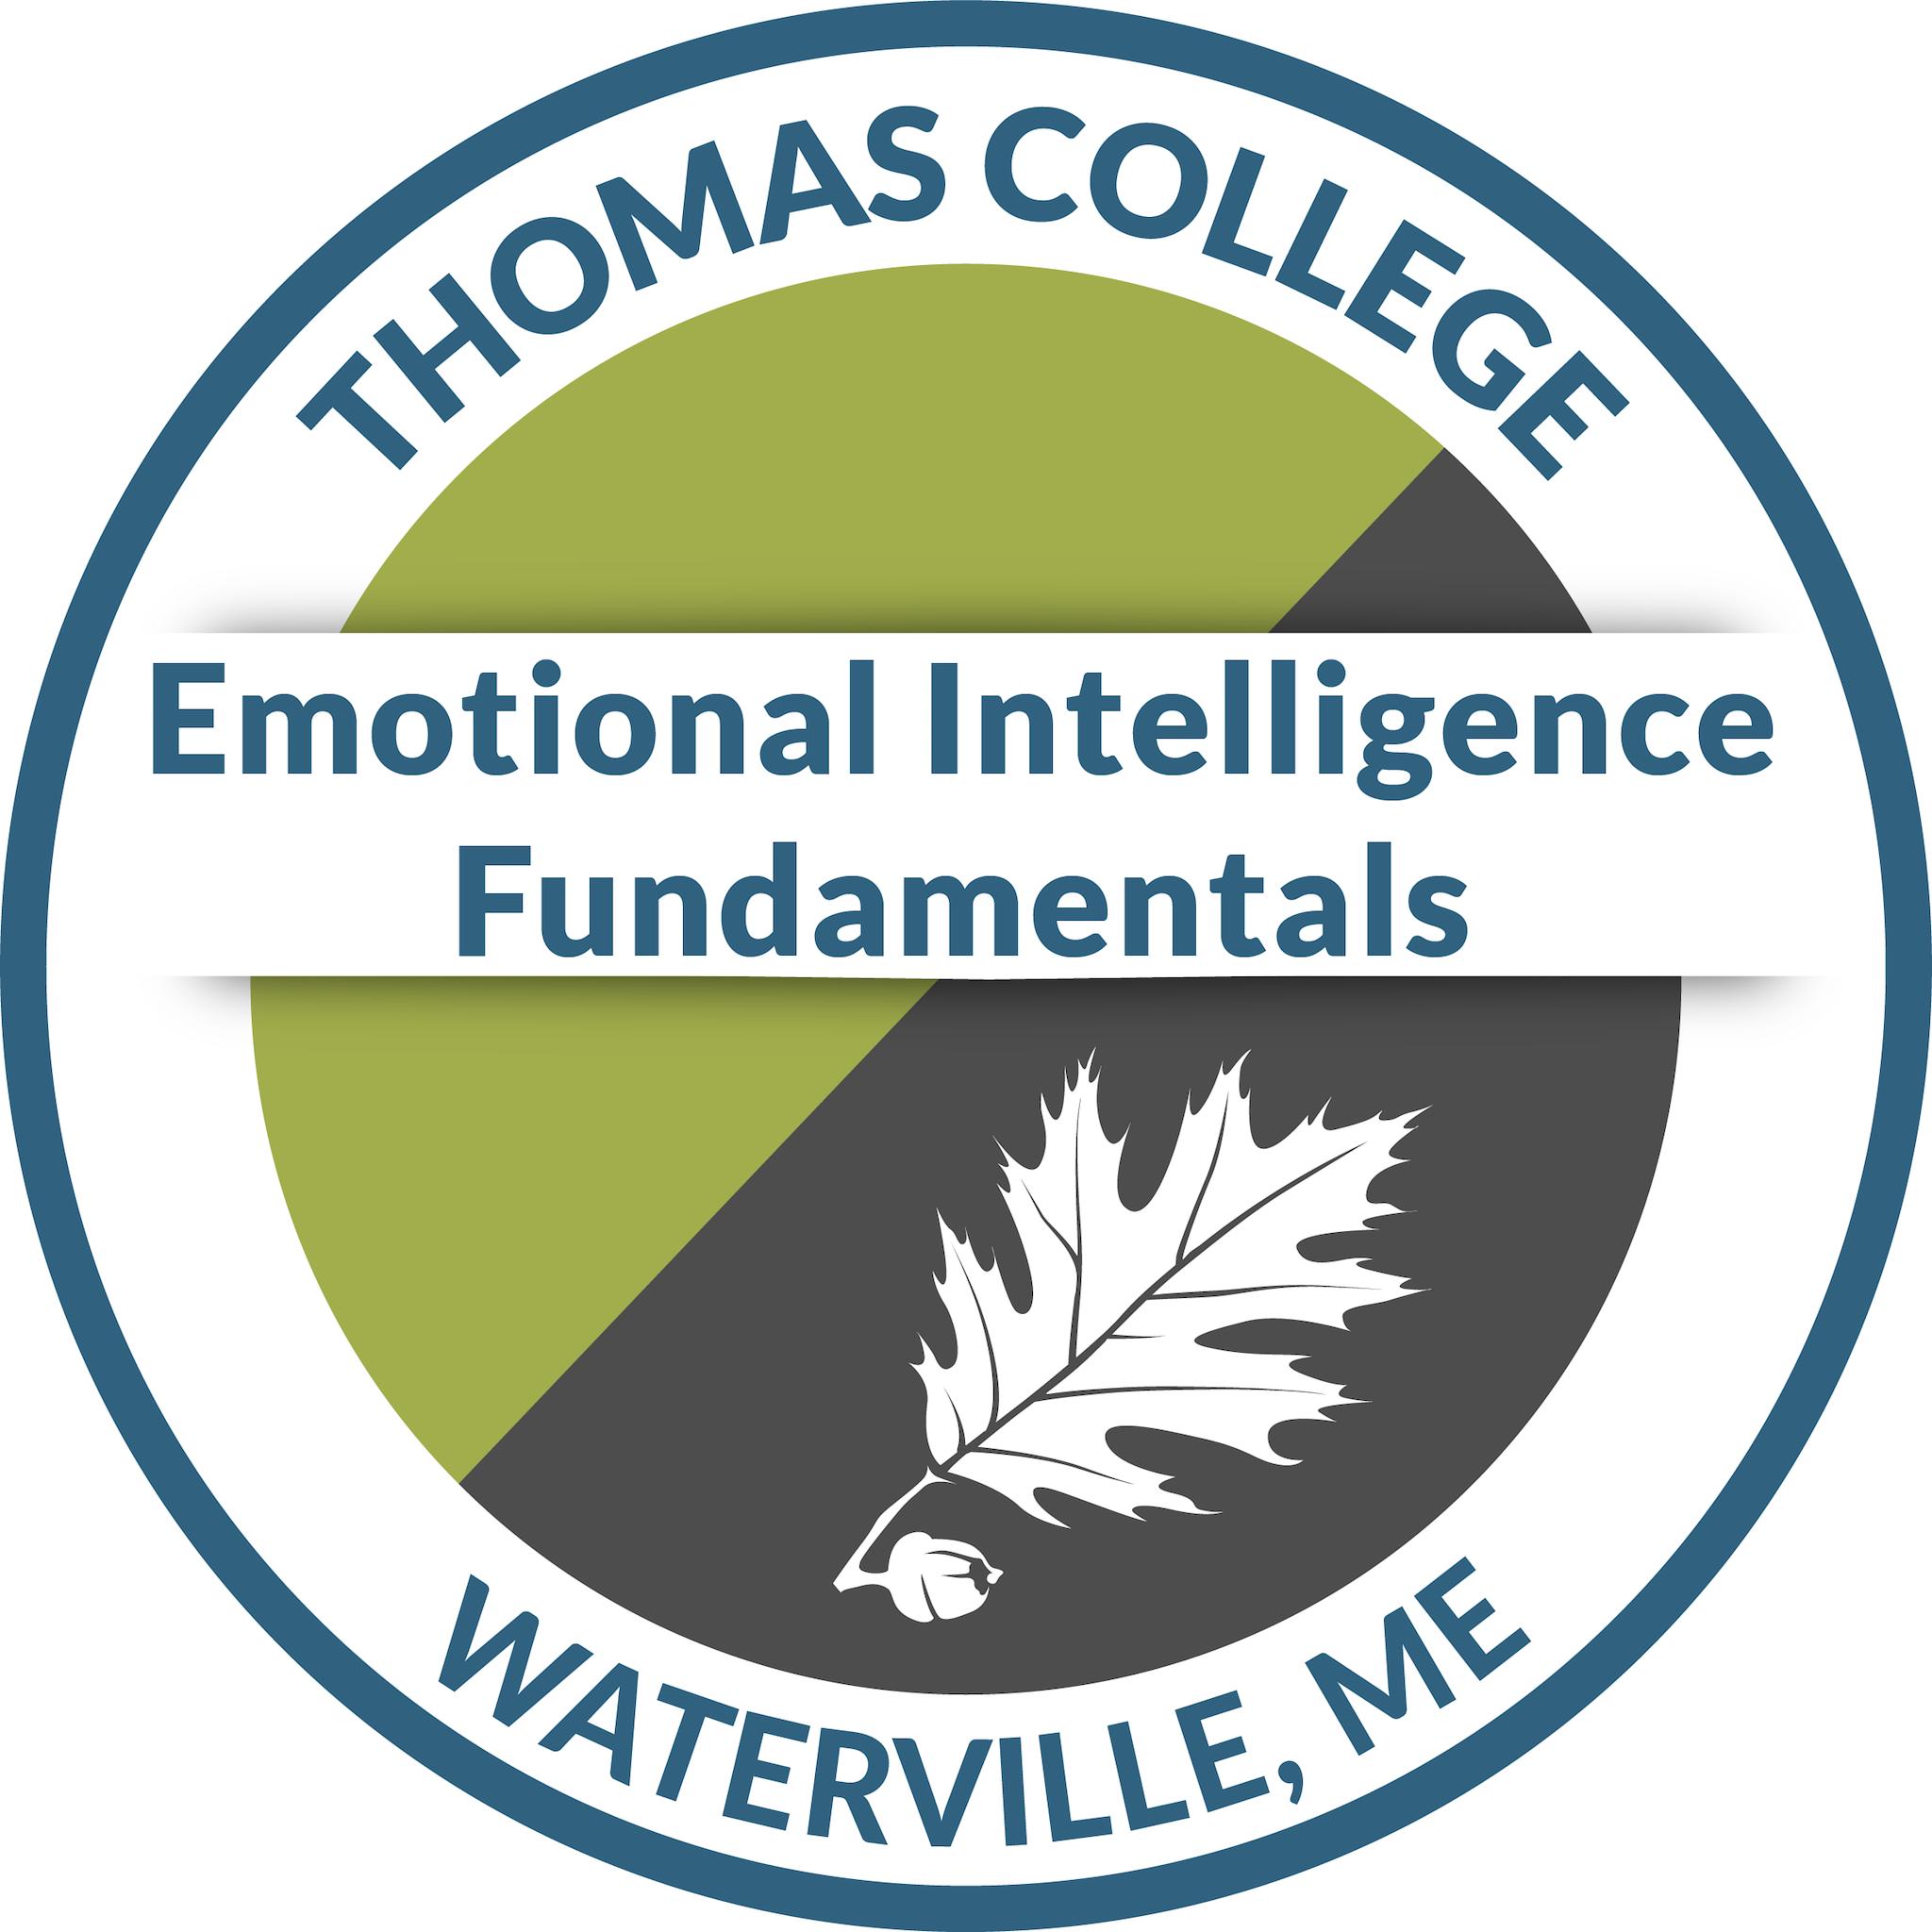 Emotional Intelligence Fundamentals